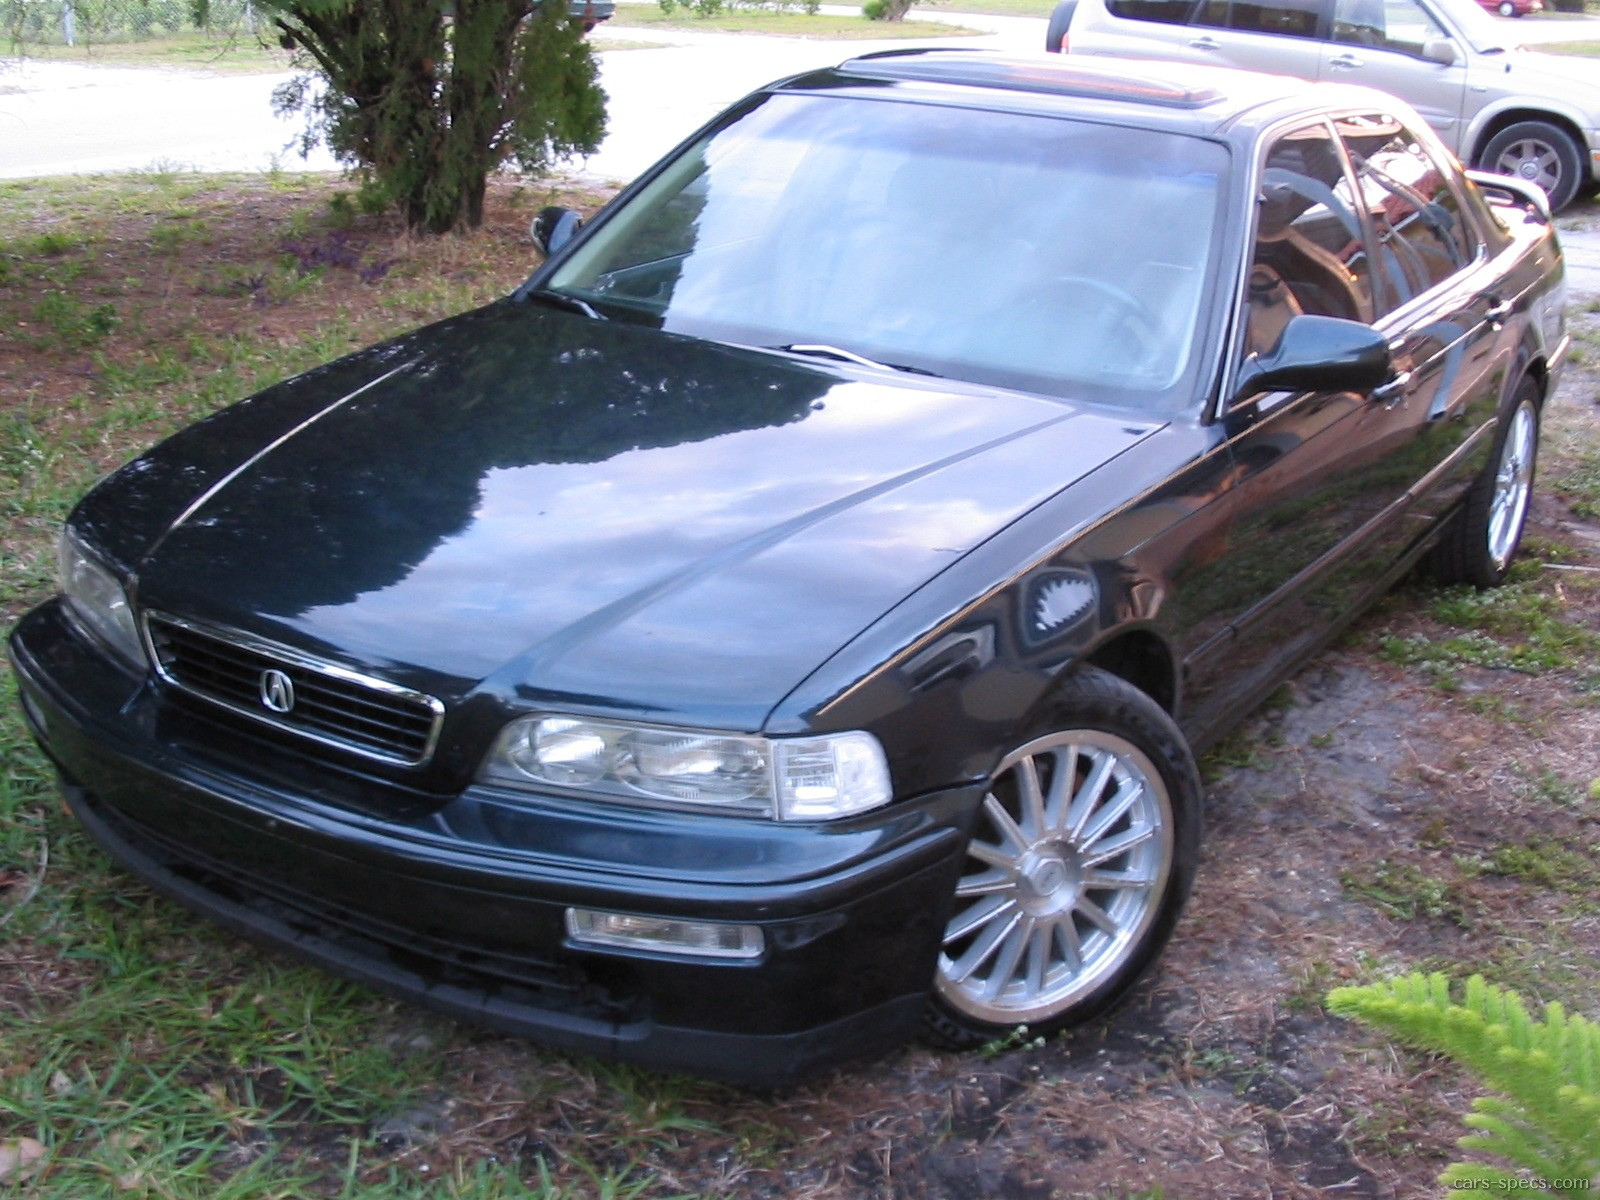 1991 Acura Legend Sedan Specifications, Pictures, Prices